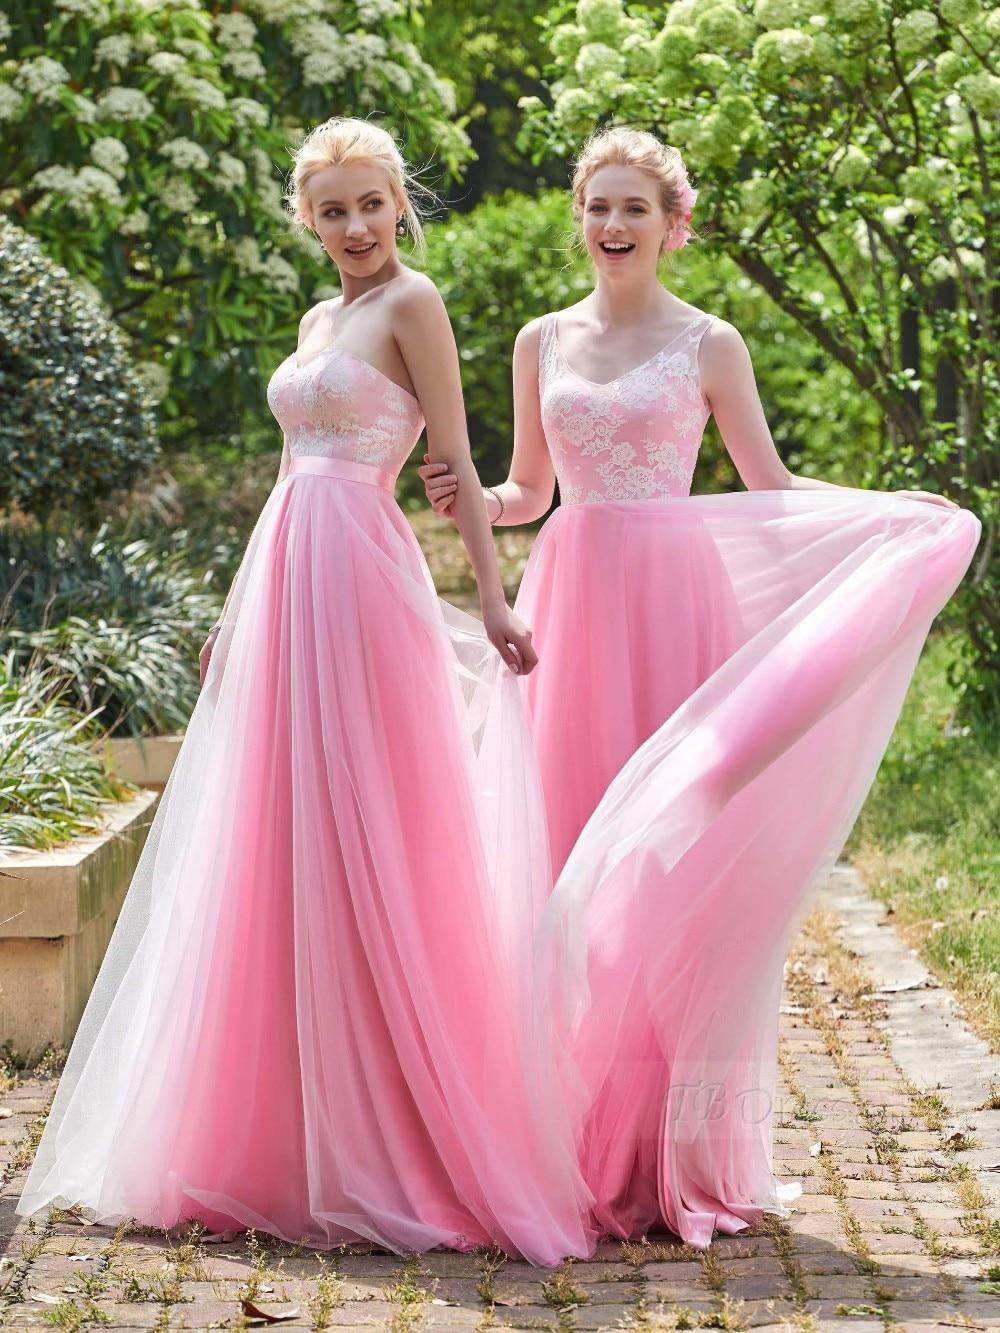 Moderno Vestidos De Las Damas Retro Inspiración - Colección de ...